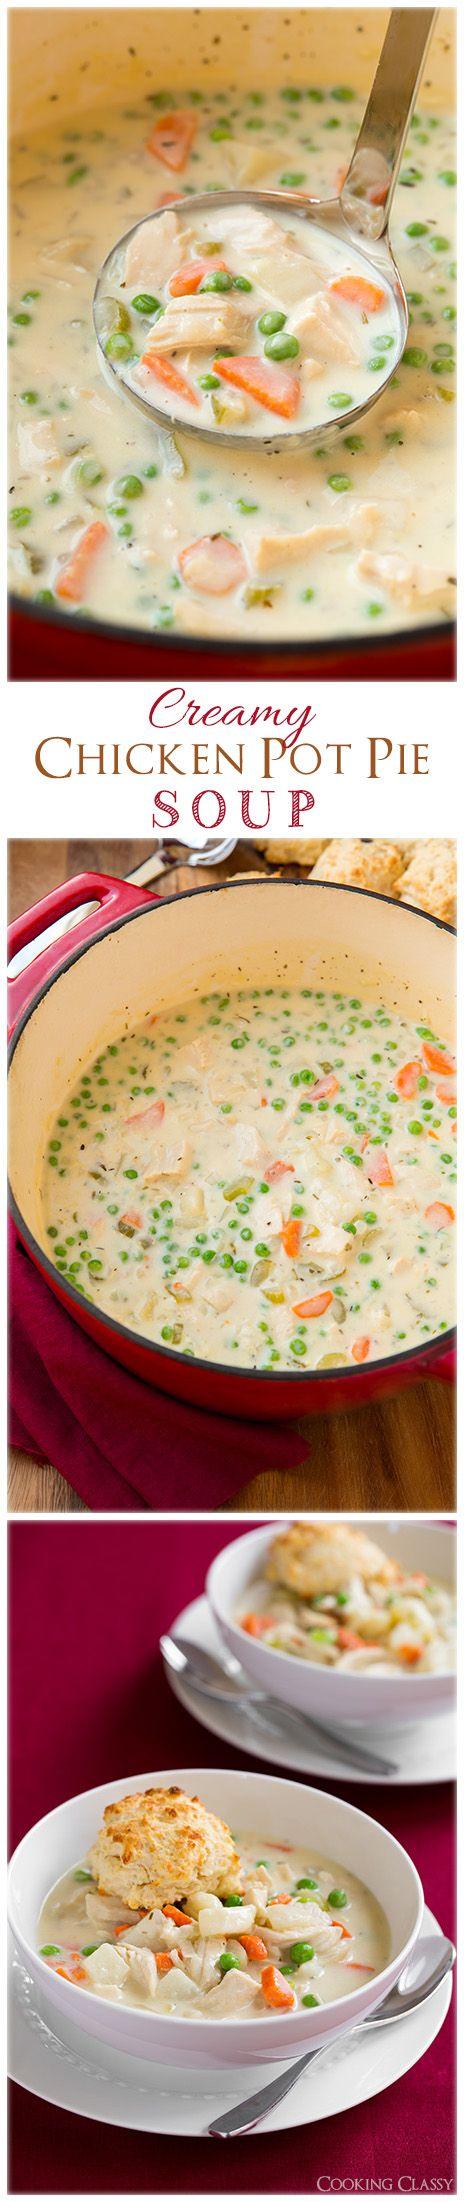 Creamy Chicken Pot Pie Soup with Parmesan Drop Biscuits ...